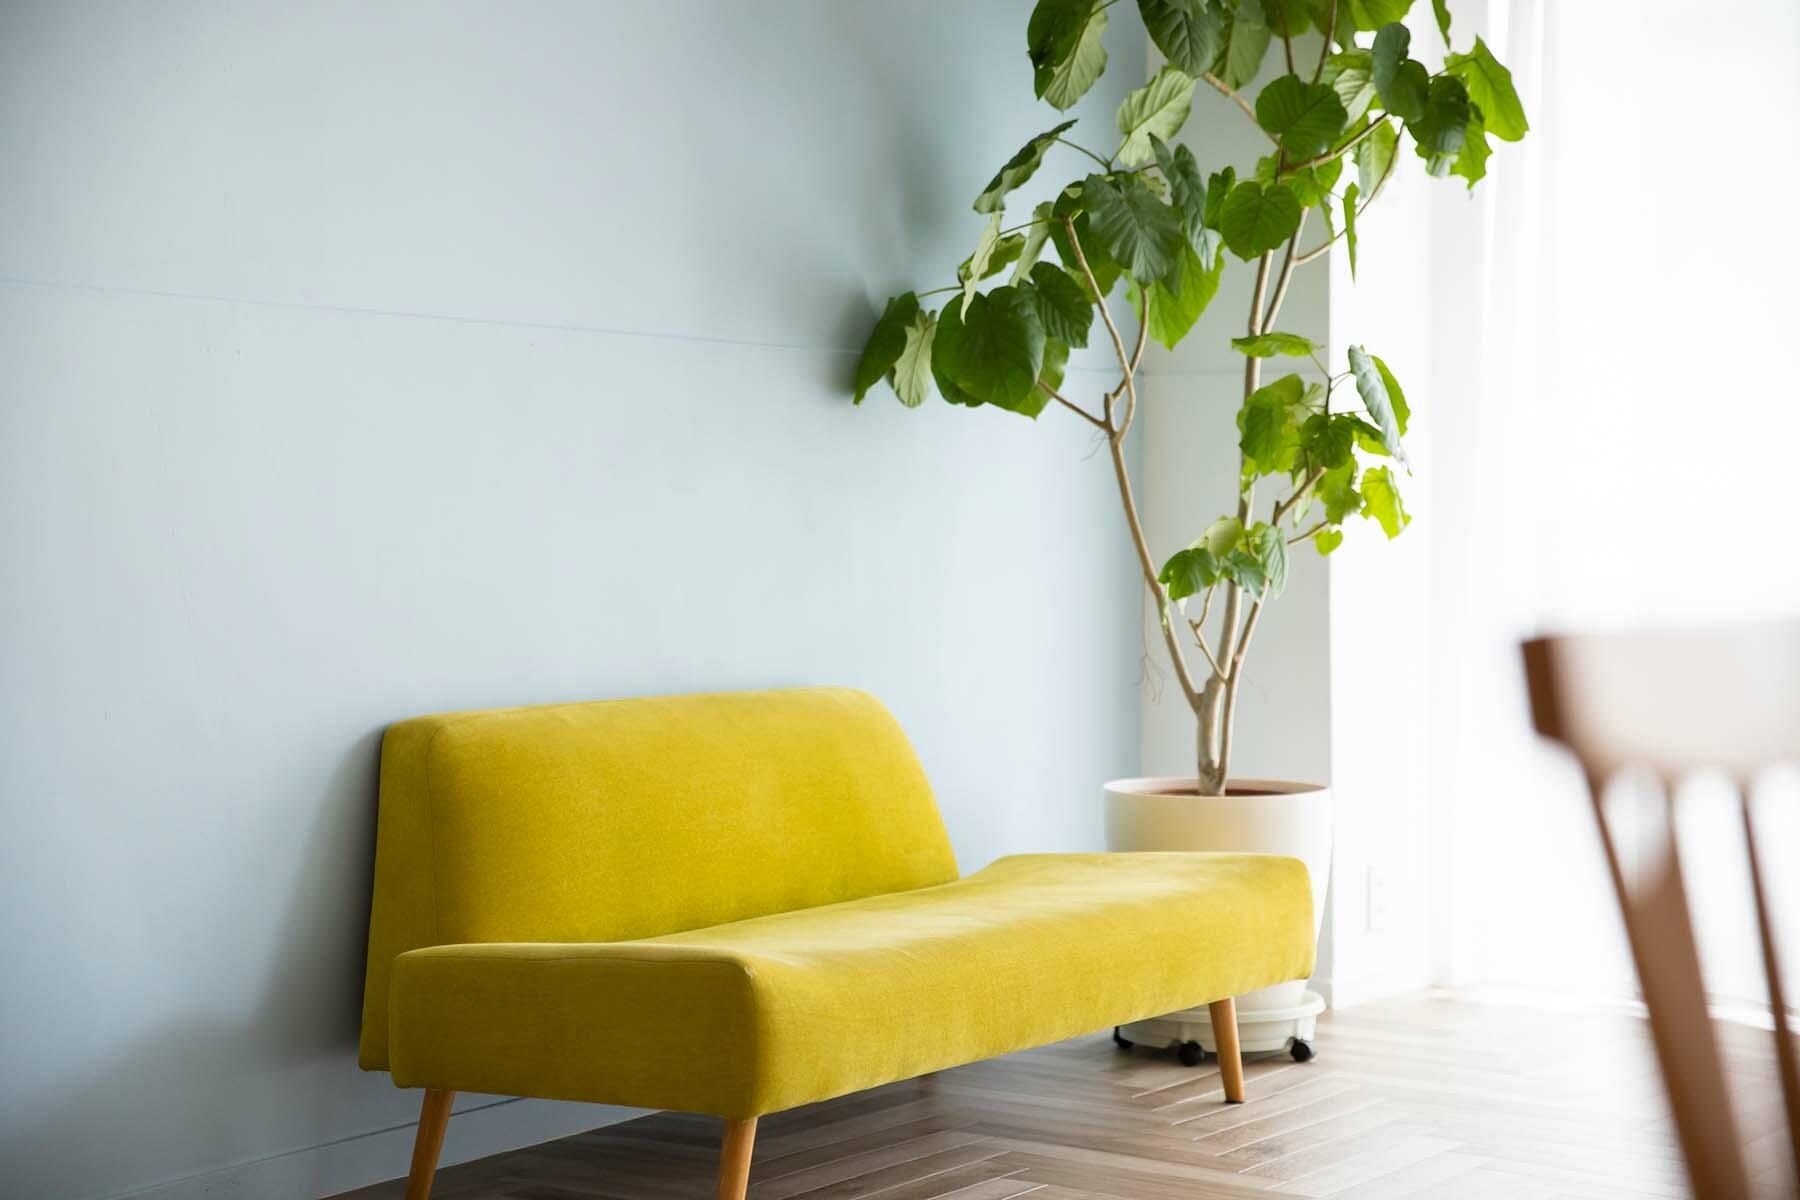 STUDIO NONAMES MEJIRO (スタジオ ノナメス メジロ)ペールカラーの壁2面